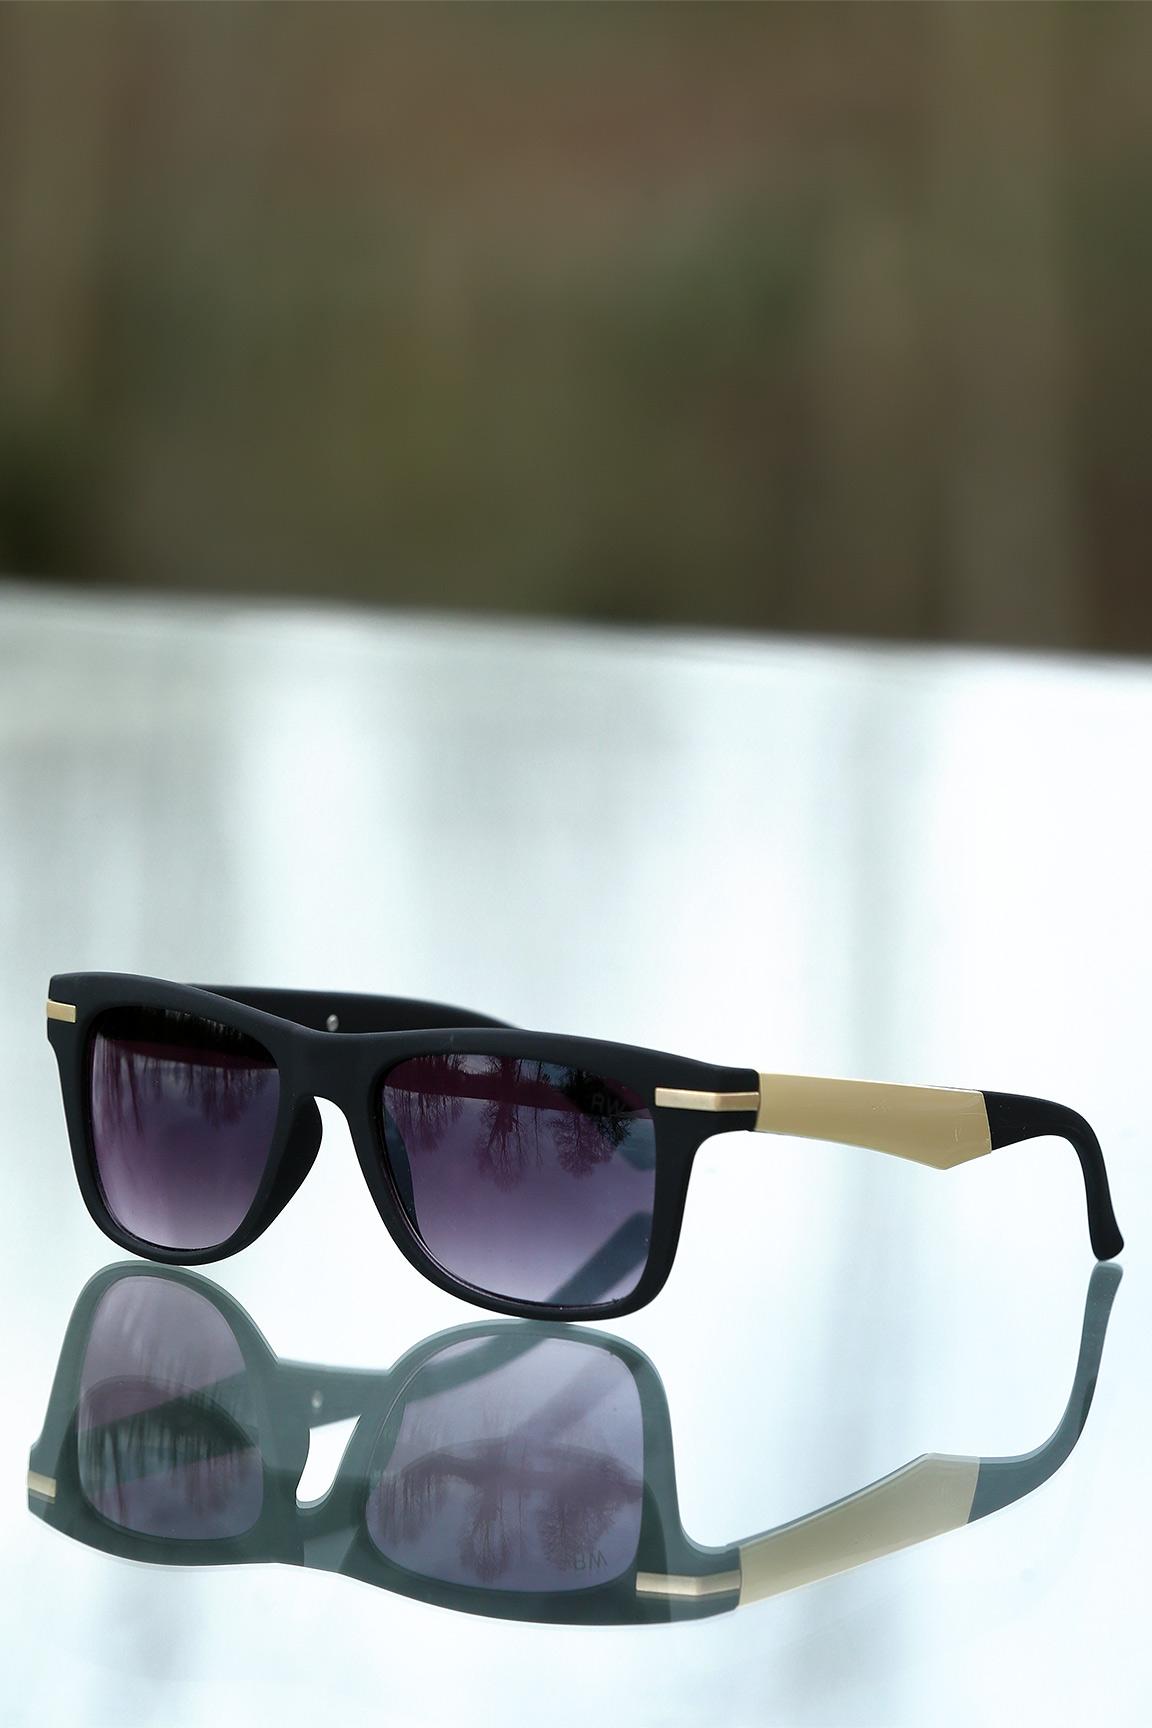 b265e03a1 كولكشن احدث نظارات شمسية نسائية و بناتي 2015, 2016 – Arab Fashion